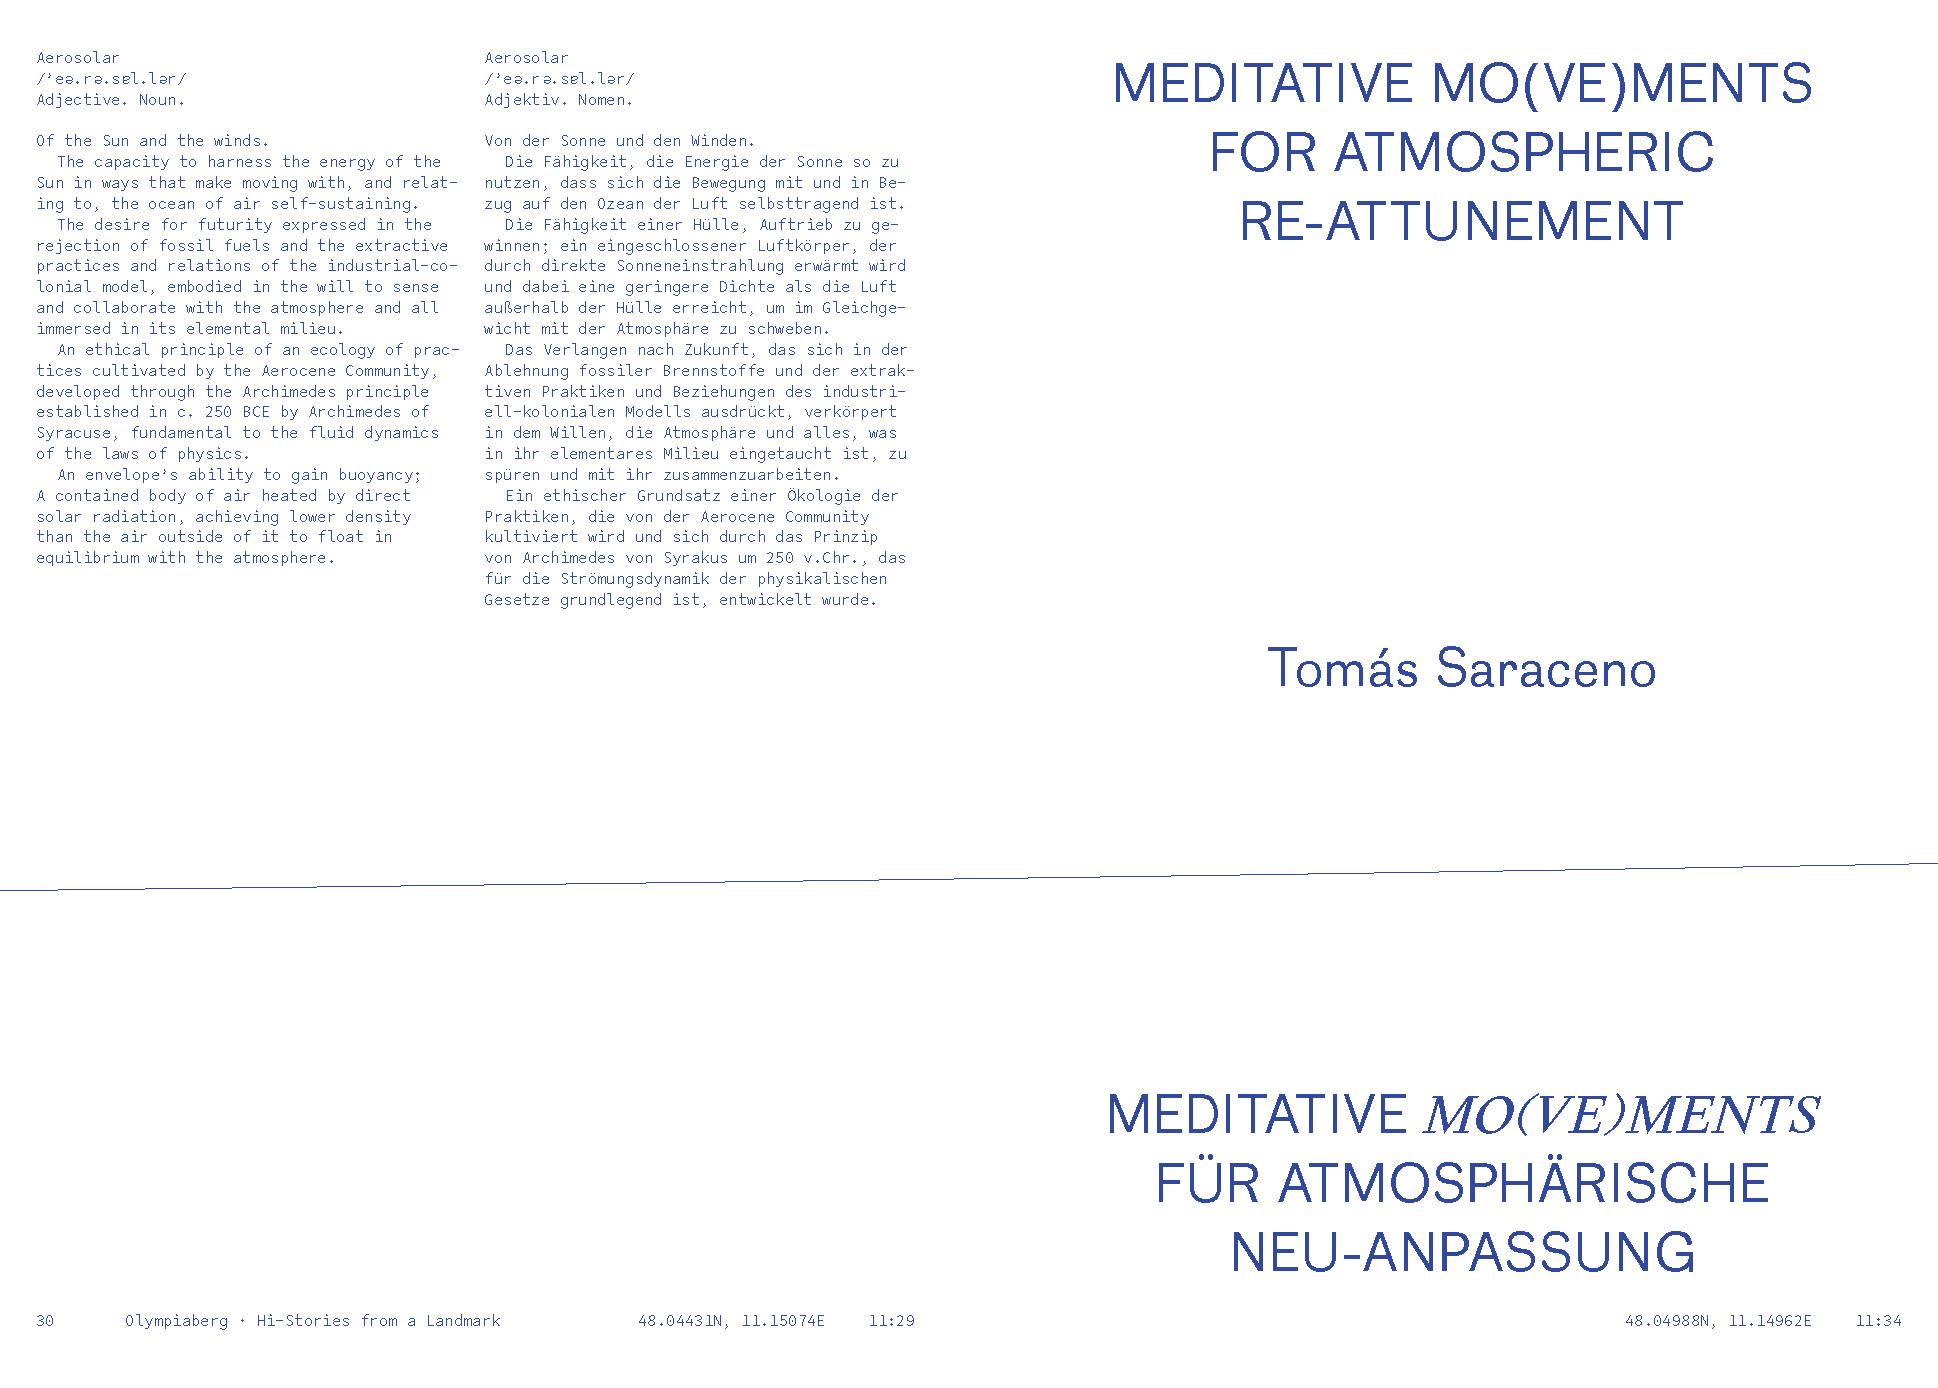 20AE_MovementsfortheAir_Aerocene (1)_Page_016